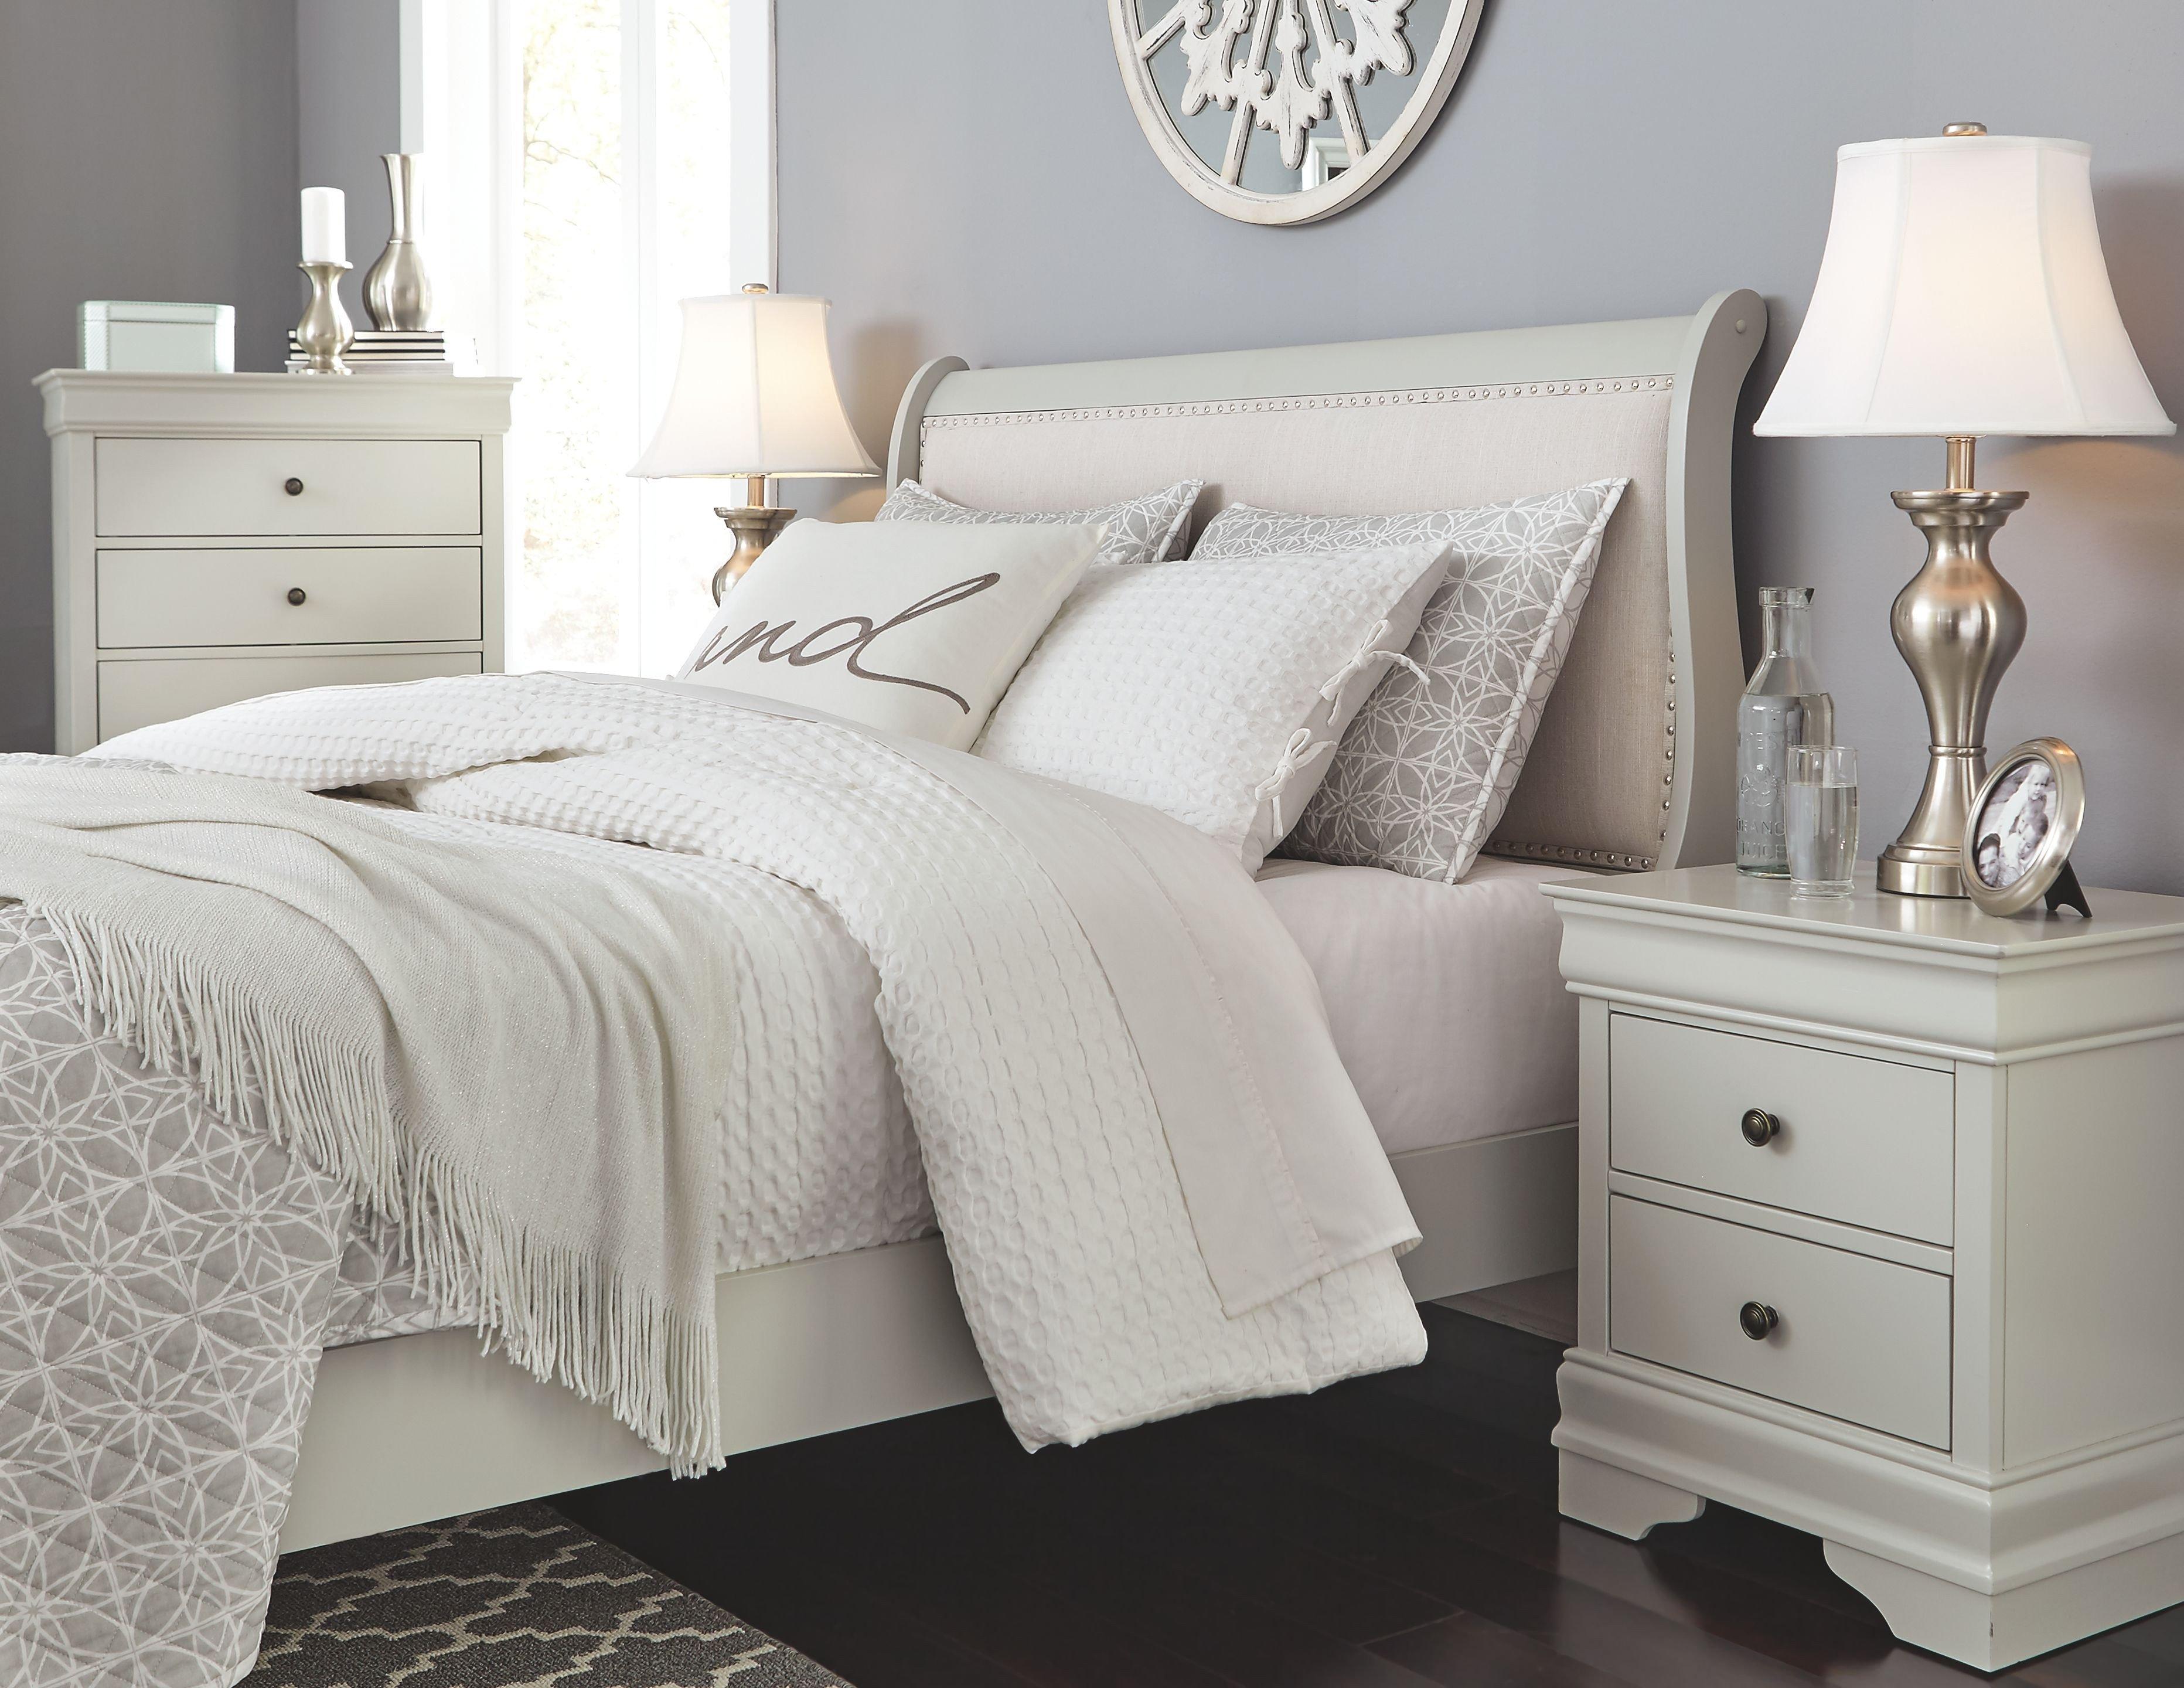 Bedroom Set ashley Furniture Elegant Jorstad Full Bed with 2 Nightstands Gray